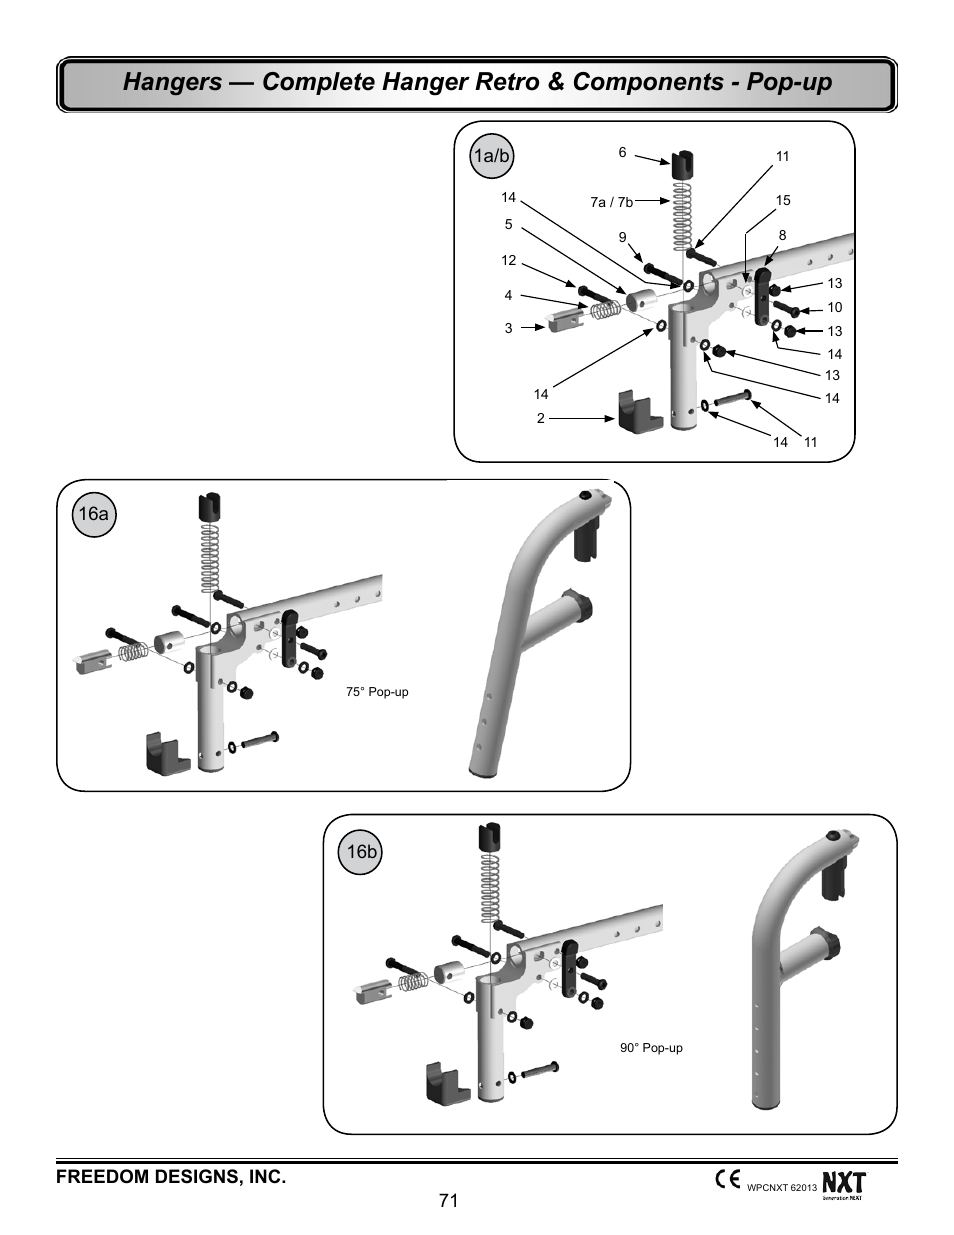 Freedom pop user manual freedompop array hanger retrofit kit pop up freedom designs freedom nxt user rh manualsdir com fandeluxe Images